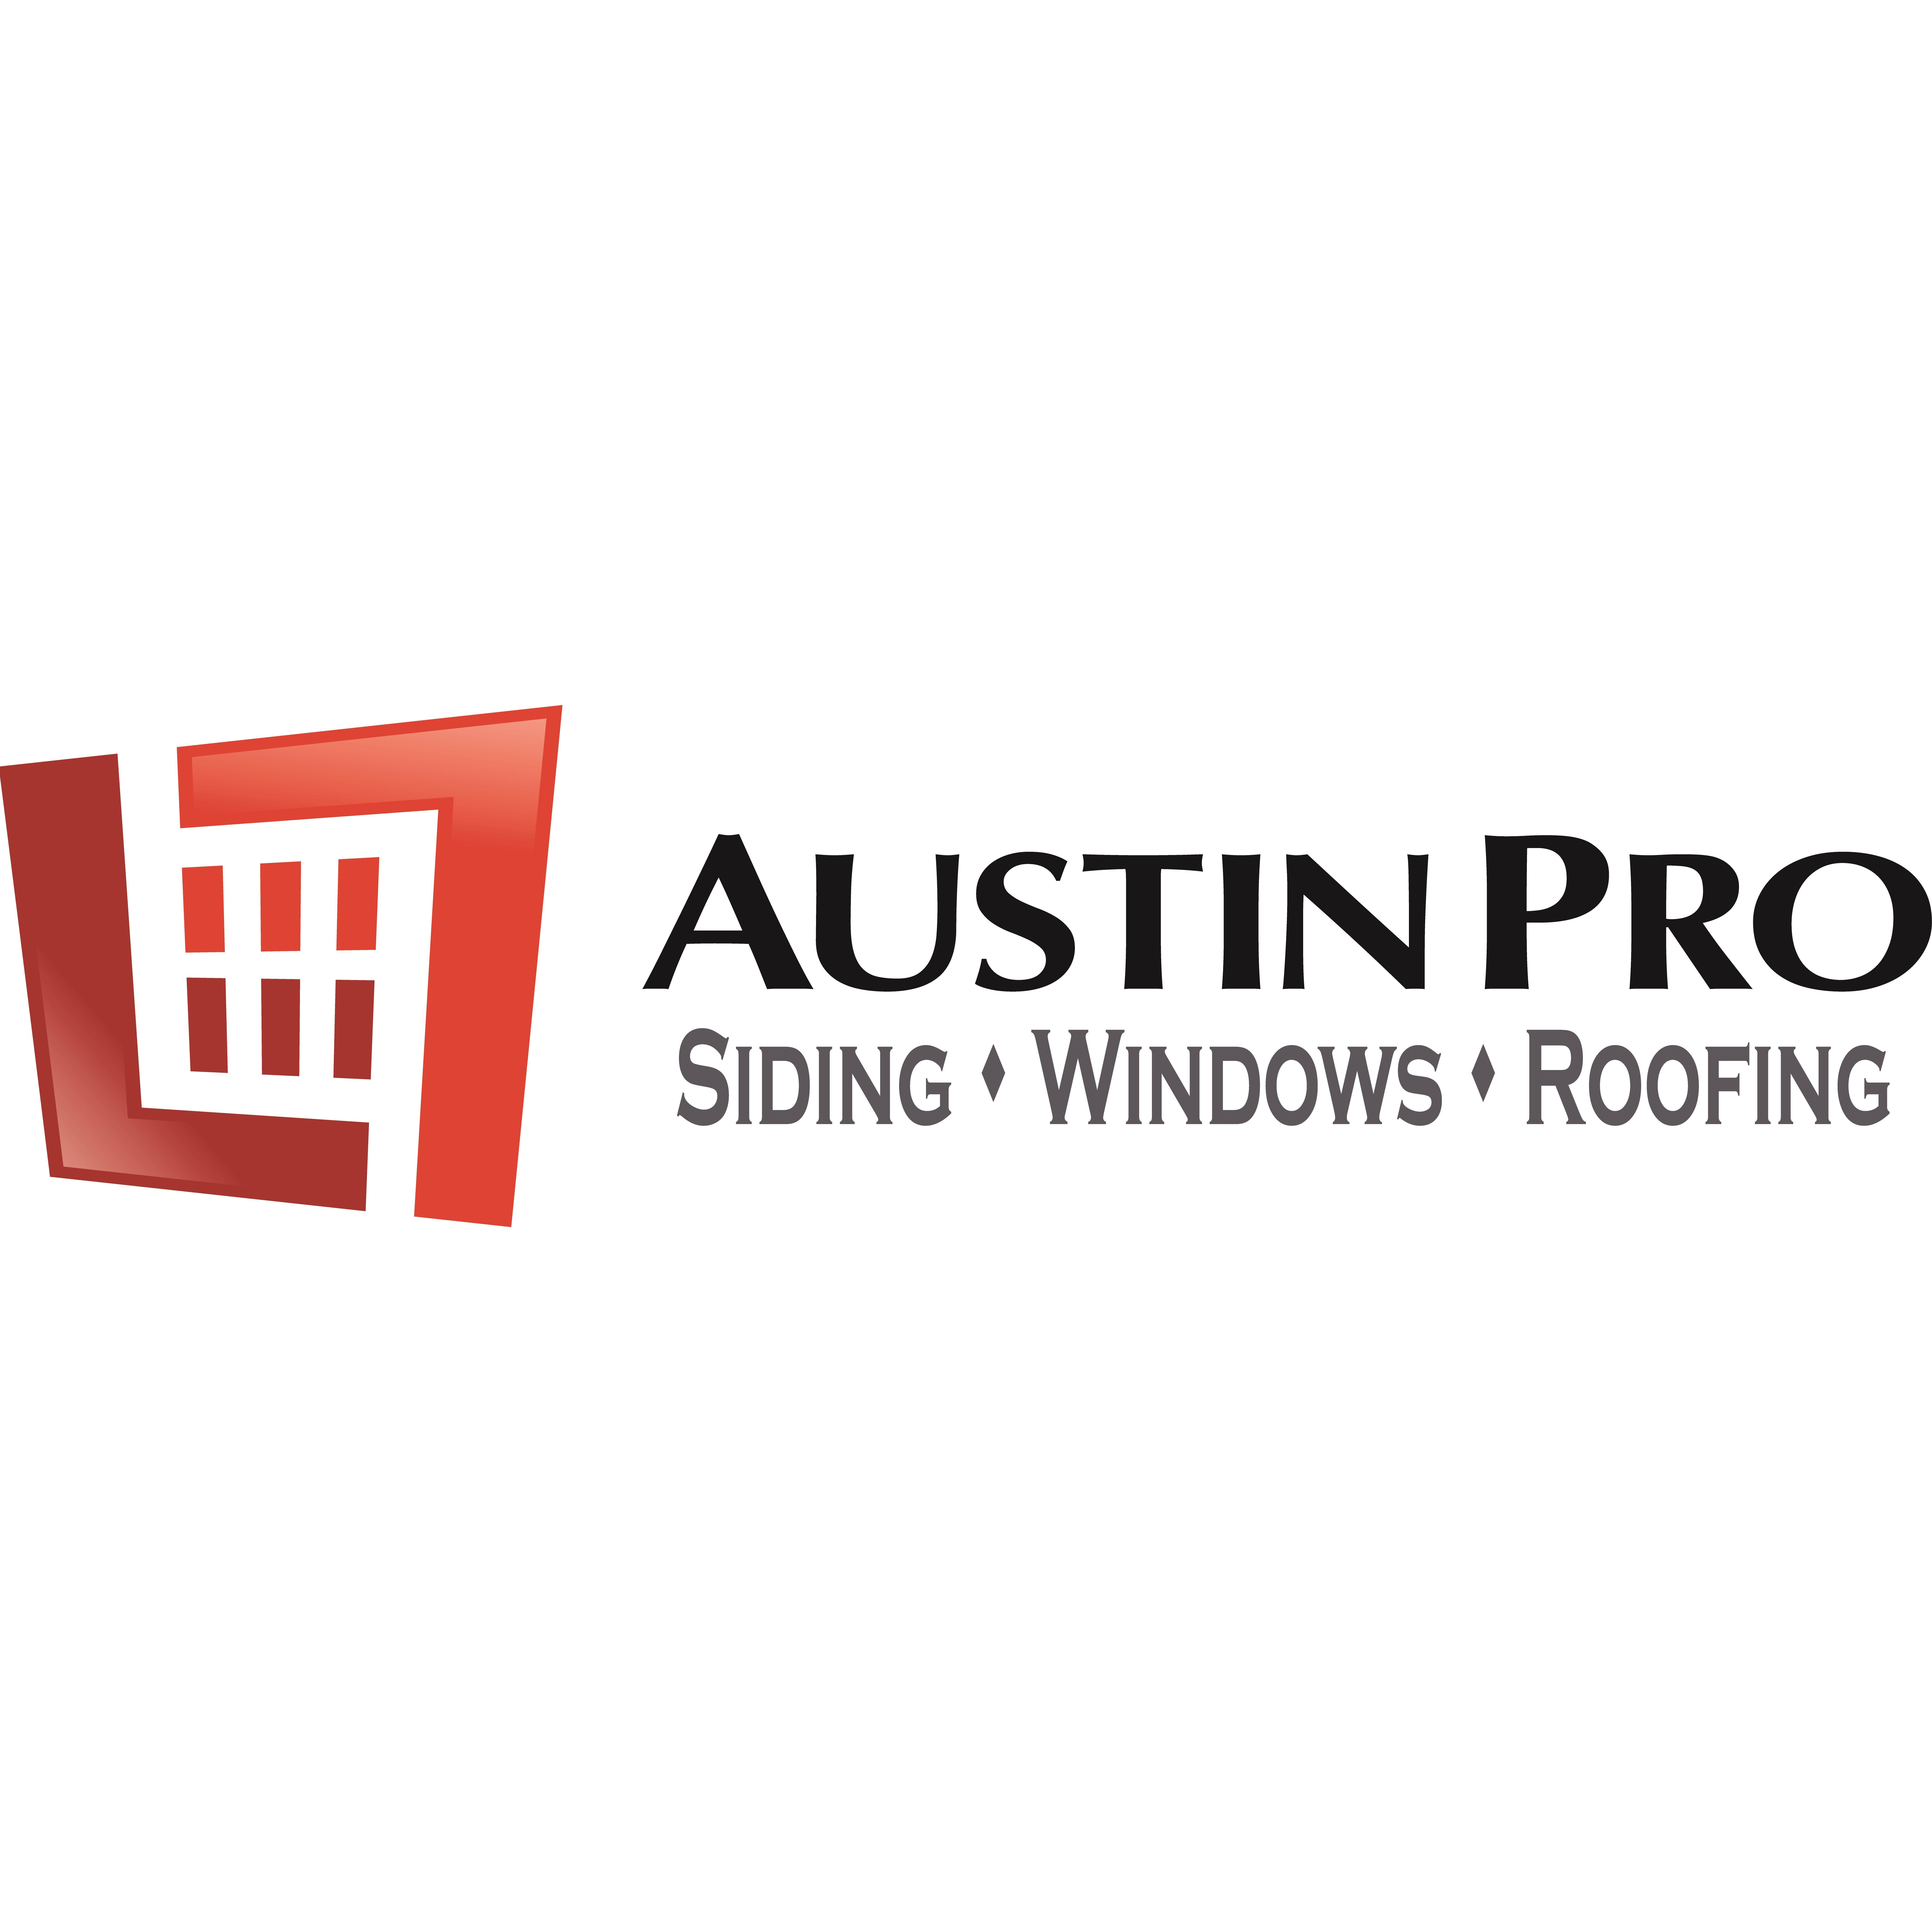 Austin Pro Siding, Windows & Roofing